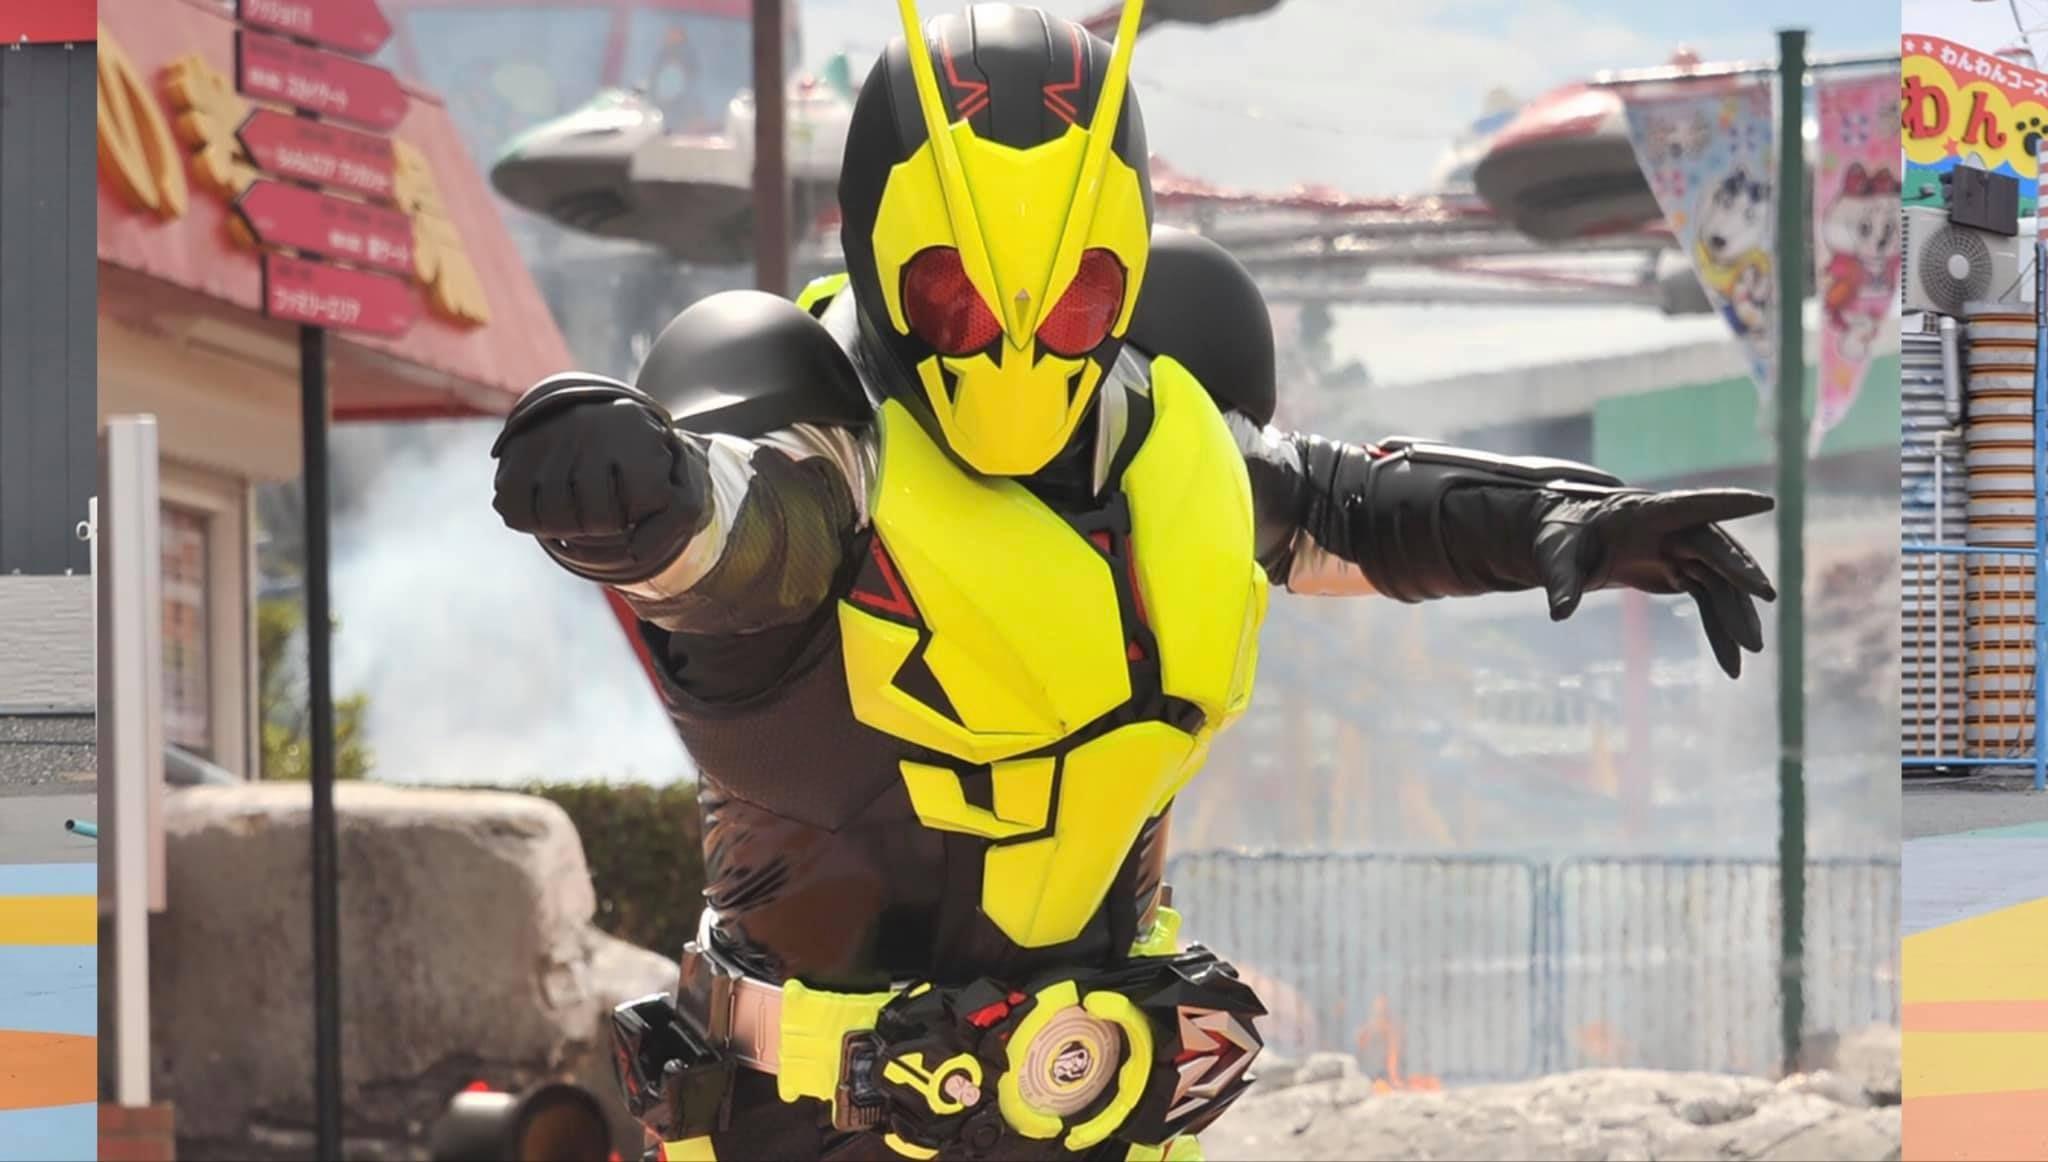 Kamen Rider Zero One Episode 1 Review I Am The President And A Kamen Rider Kamen Rider Zero One Kamen Rider Series